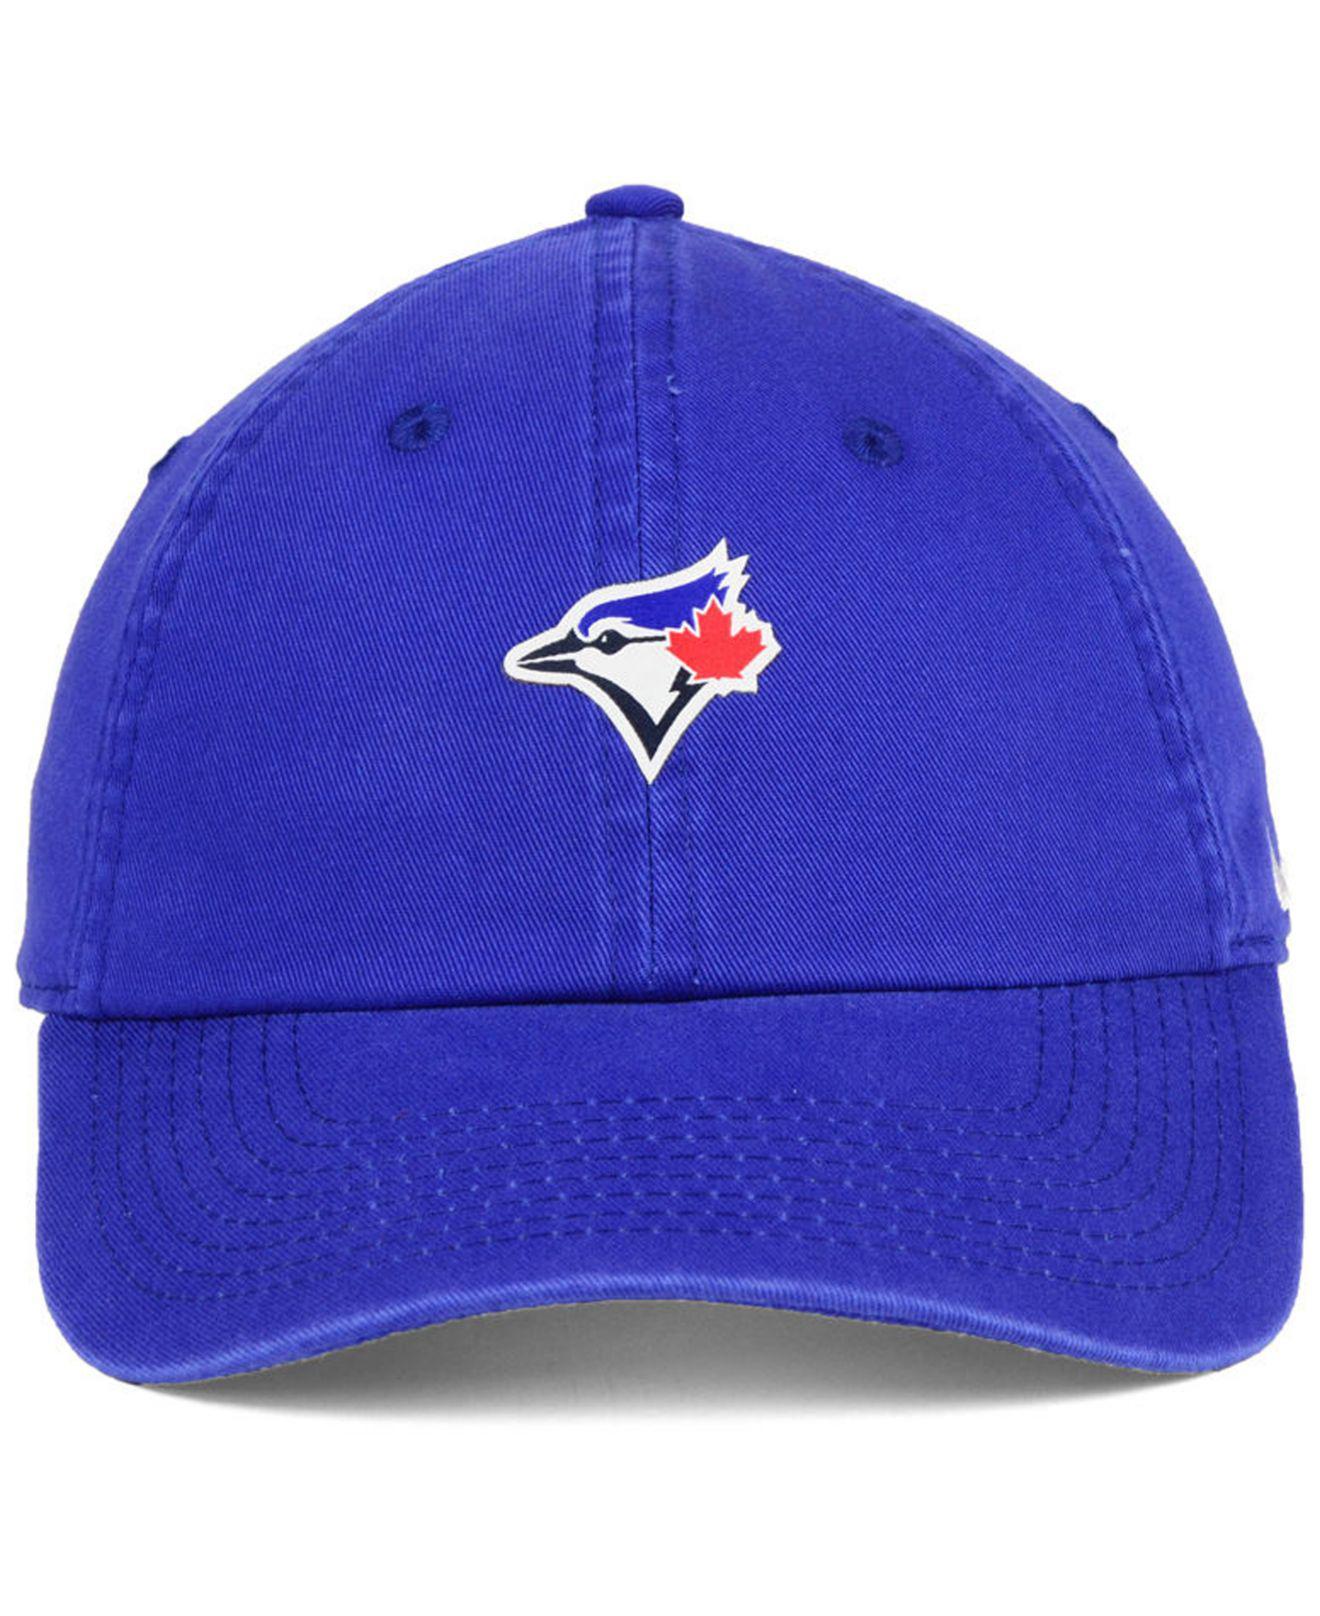 5212bfcff10 ... order lyst nike toronto blue jays micro cap in blue for men 8baf1 3f7e0